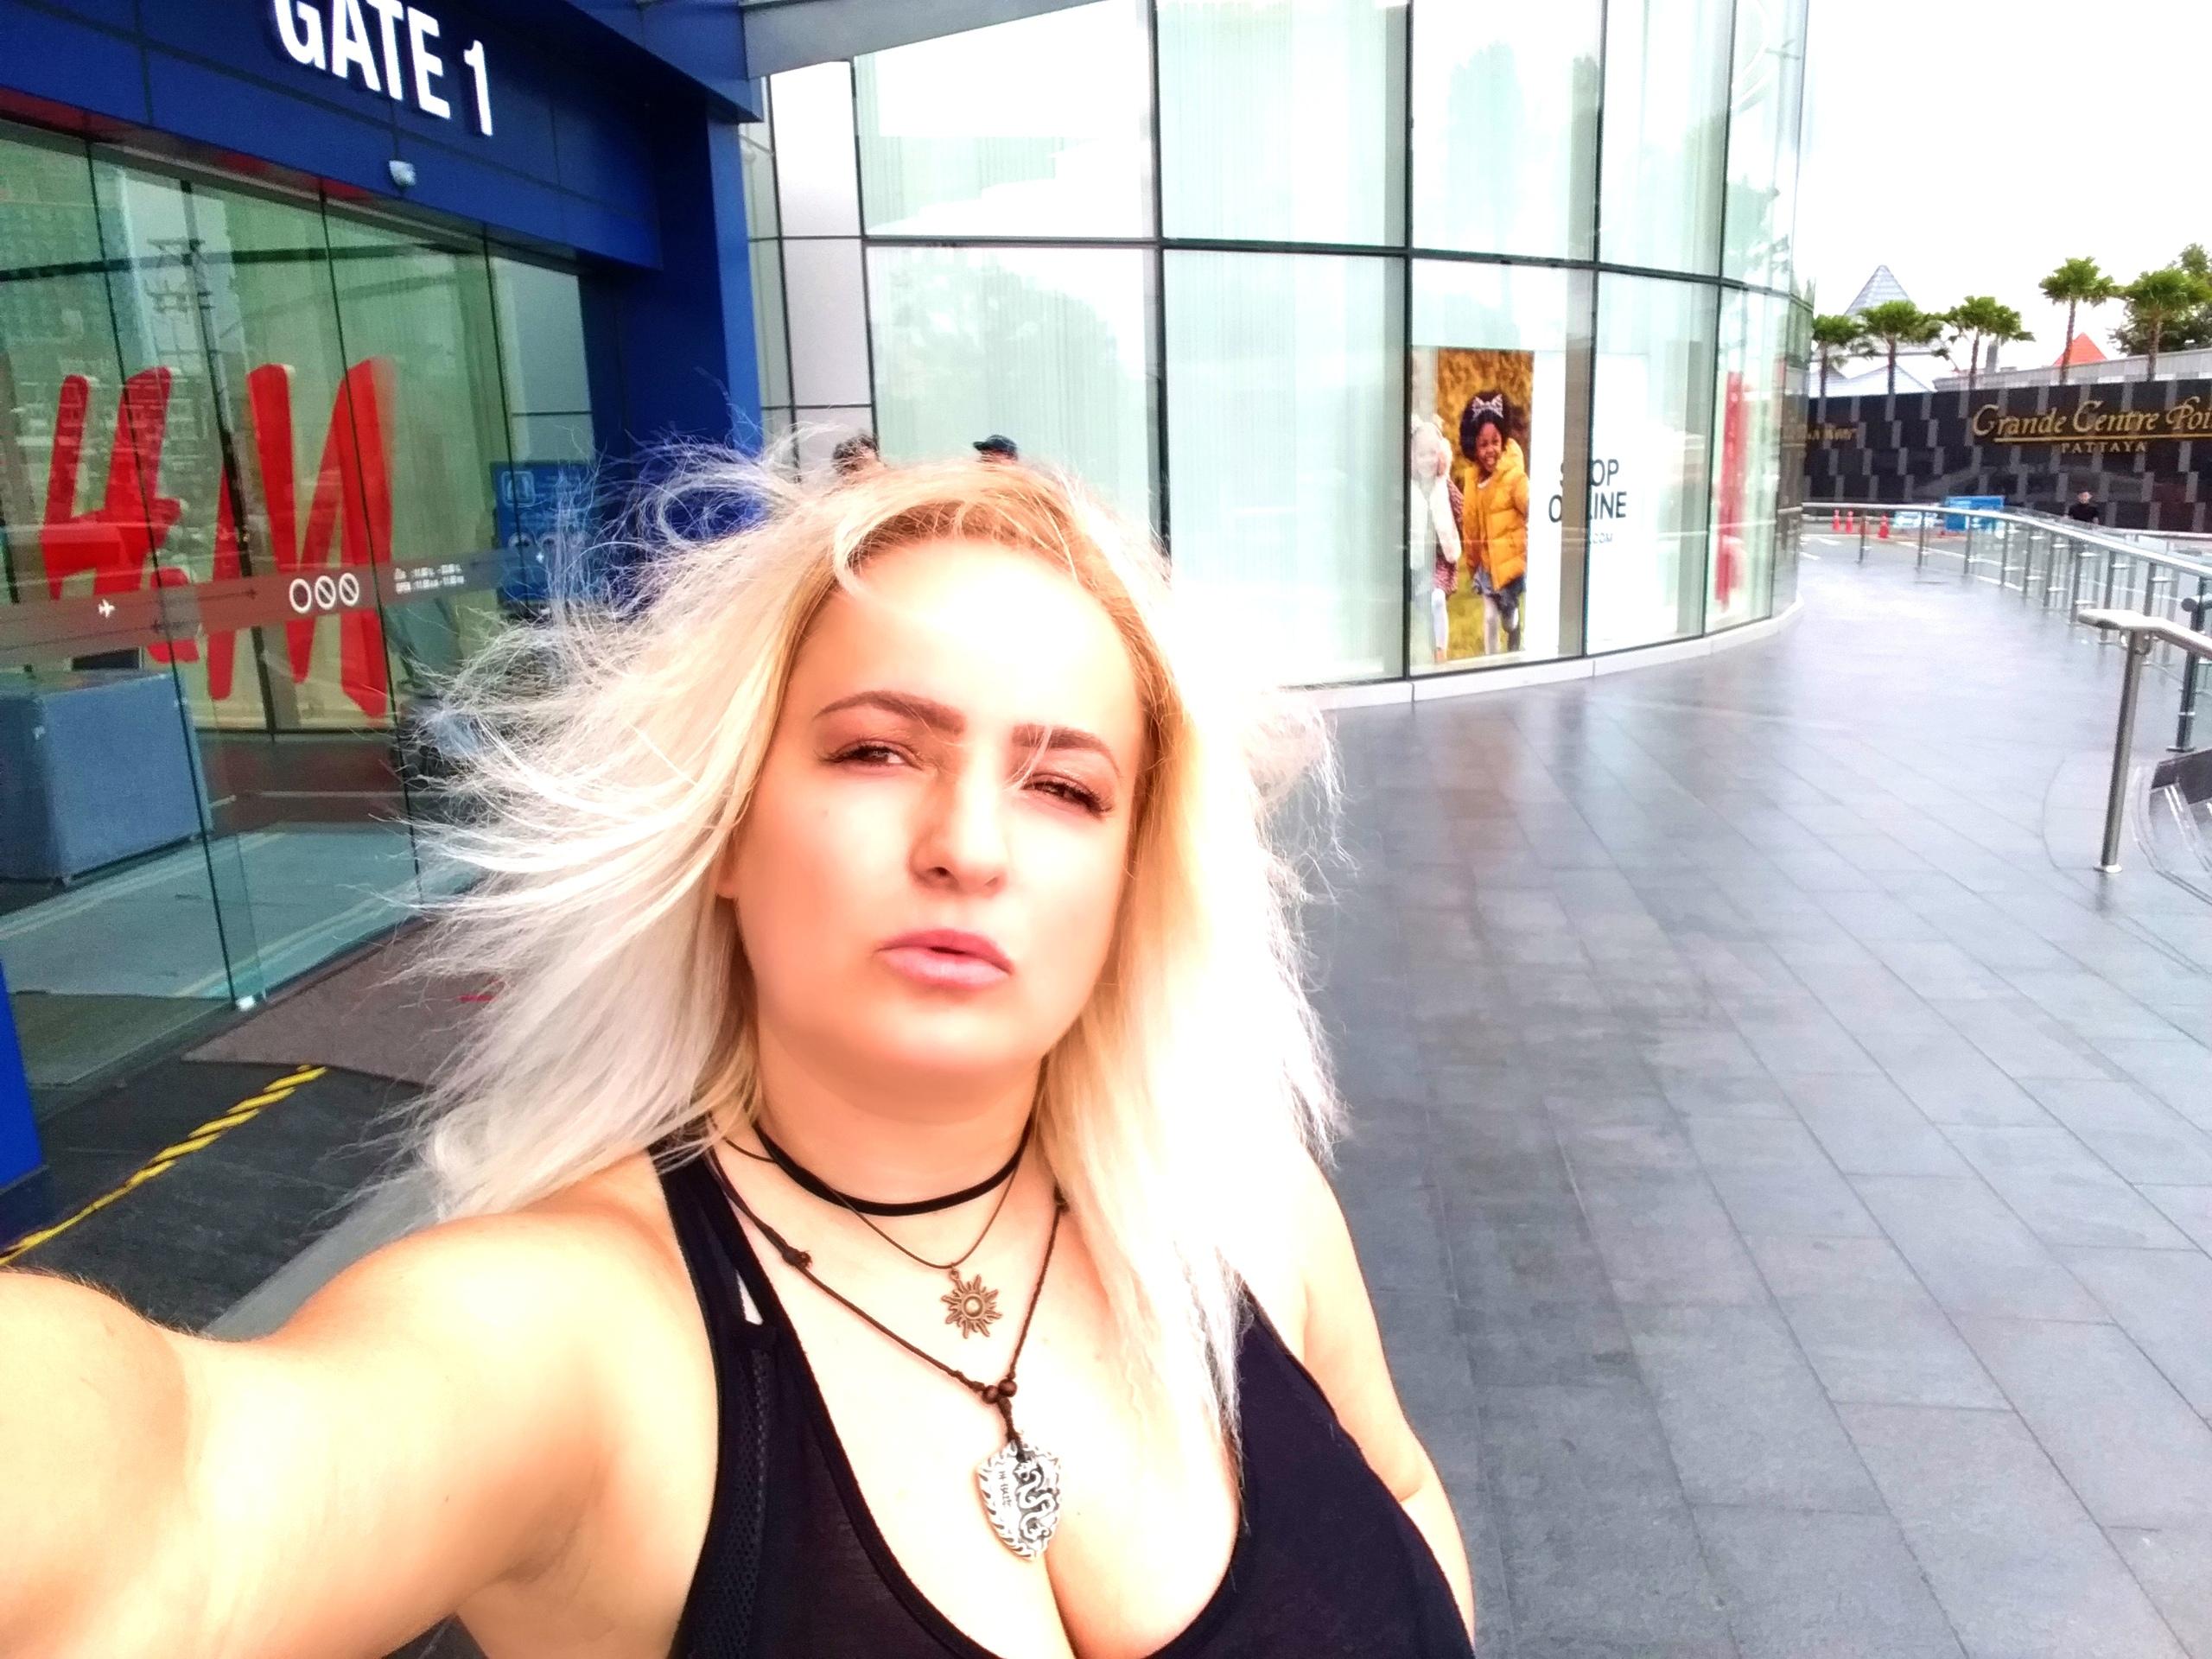 Елена Руденко (Валтея). Мои путешествия. Таиланд ( 2019 г. осень) ФОТО. Sgcy2XuwBtg